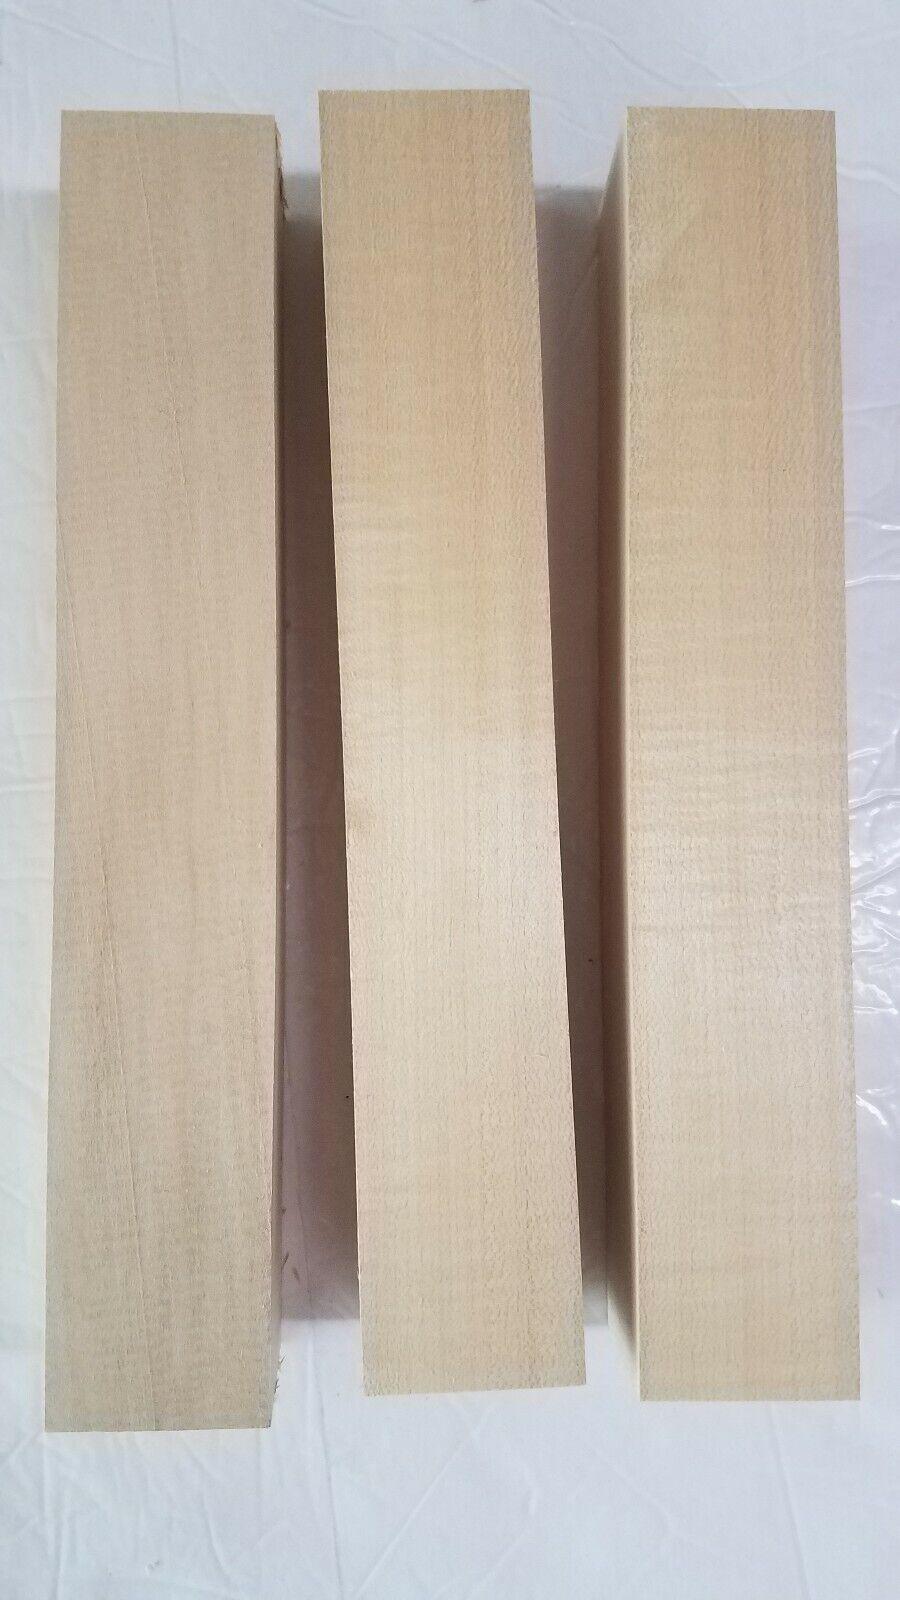 "2"" x 2"" x 12"" Basswood Carving Wood Blocks Craft Lumber *KIL"